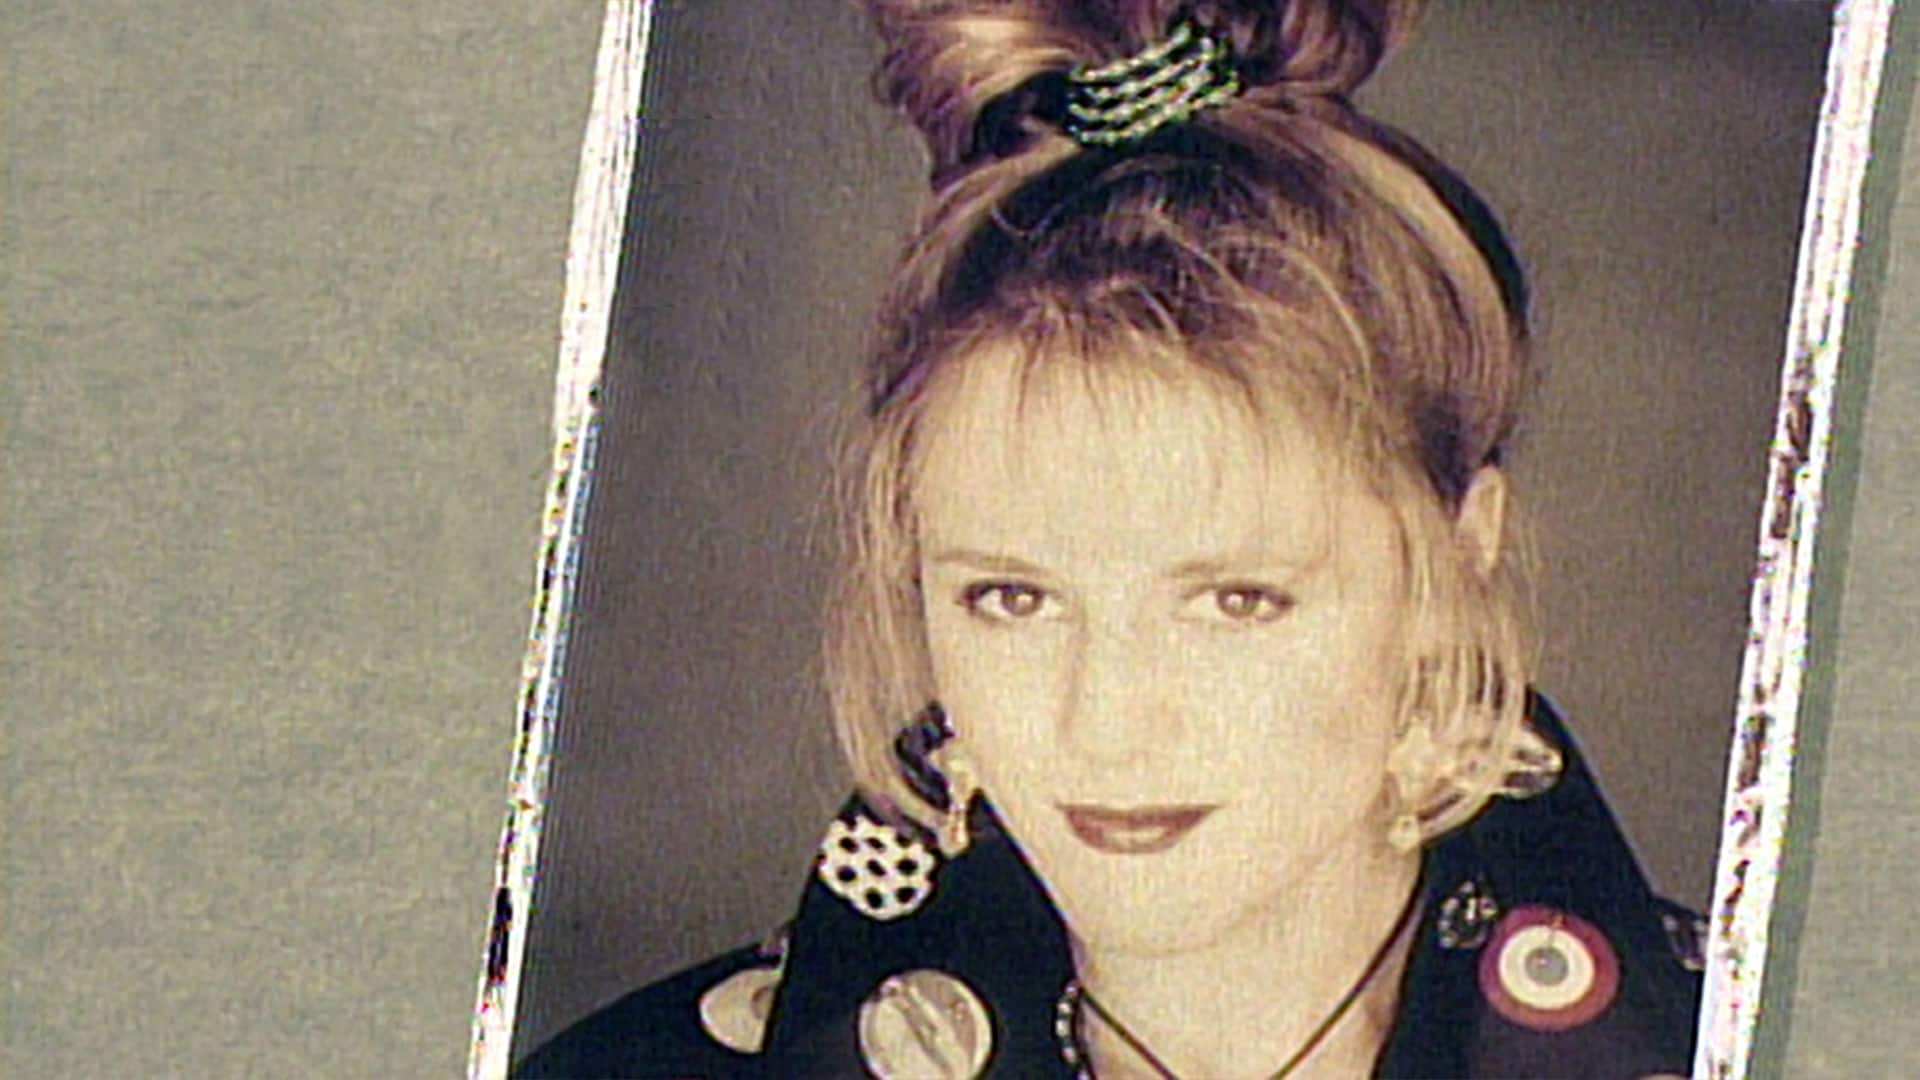 Mary Stuart Masterson: March 21, 1992